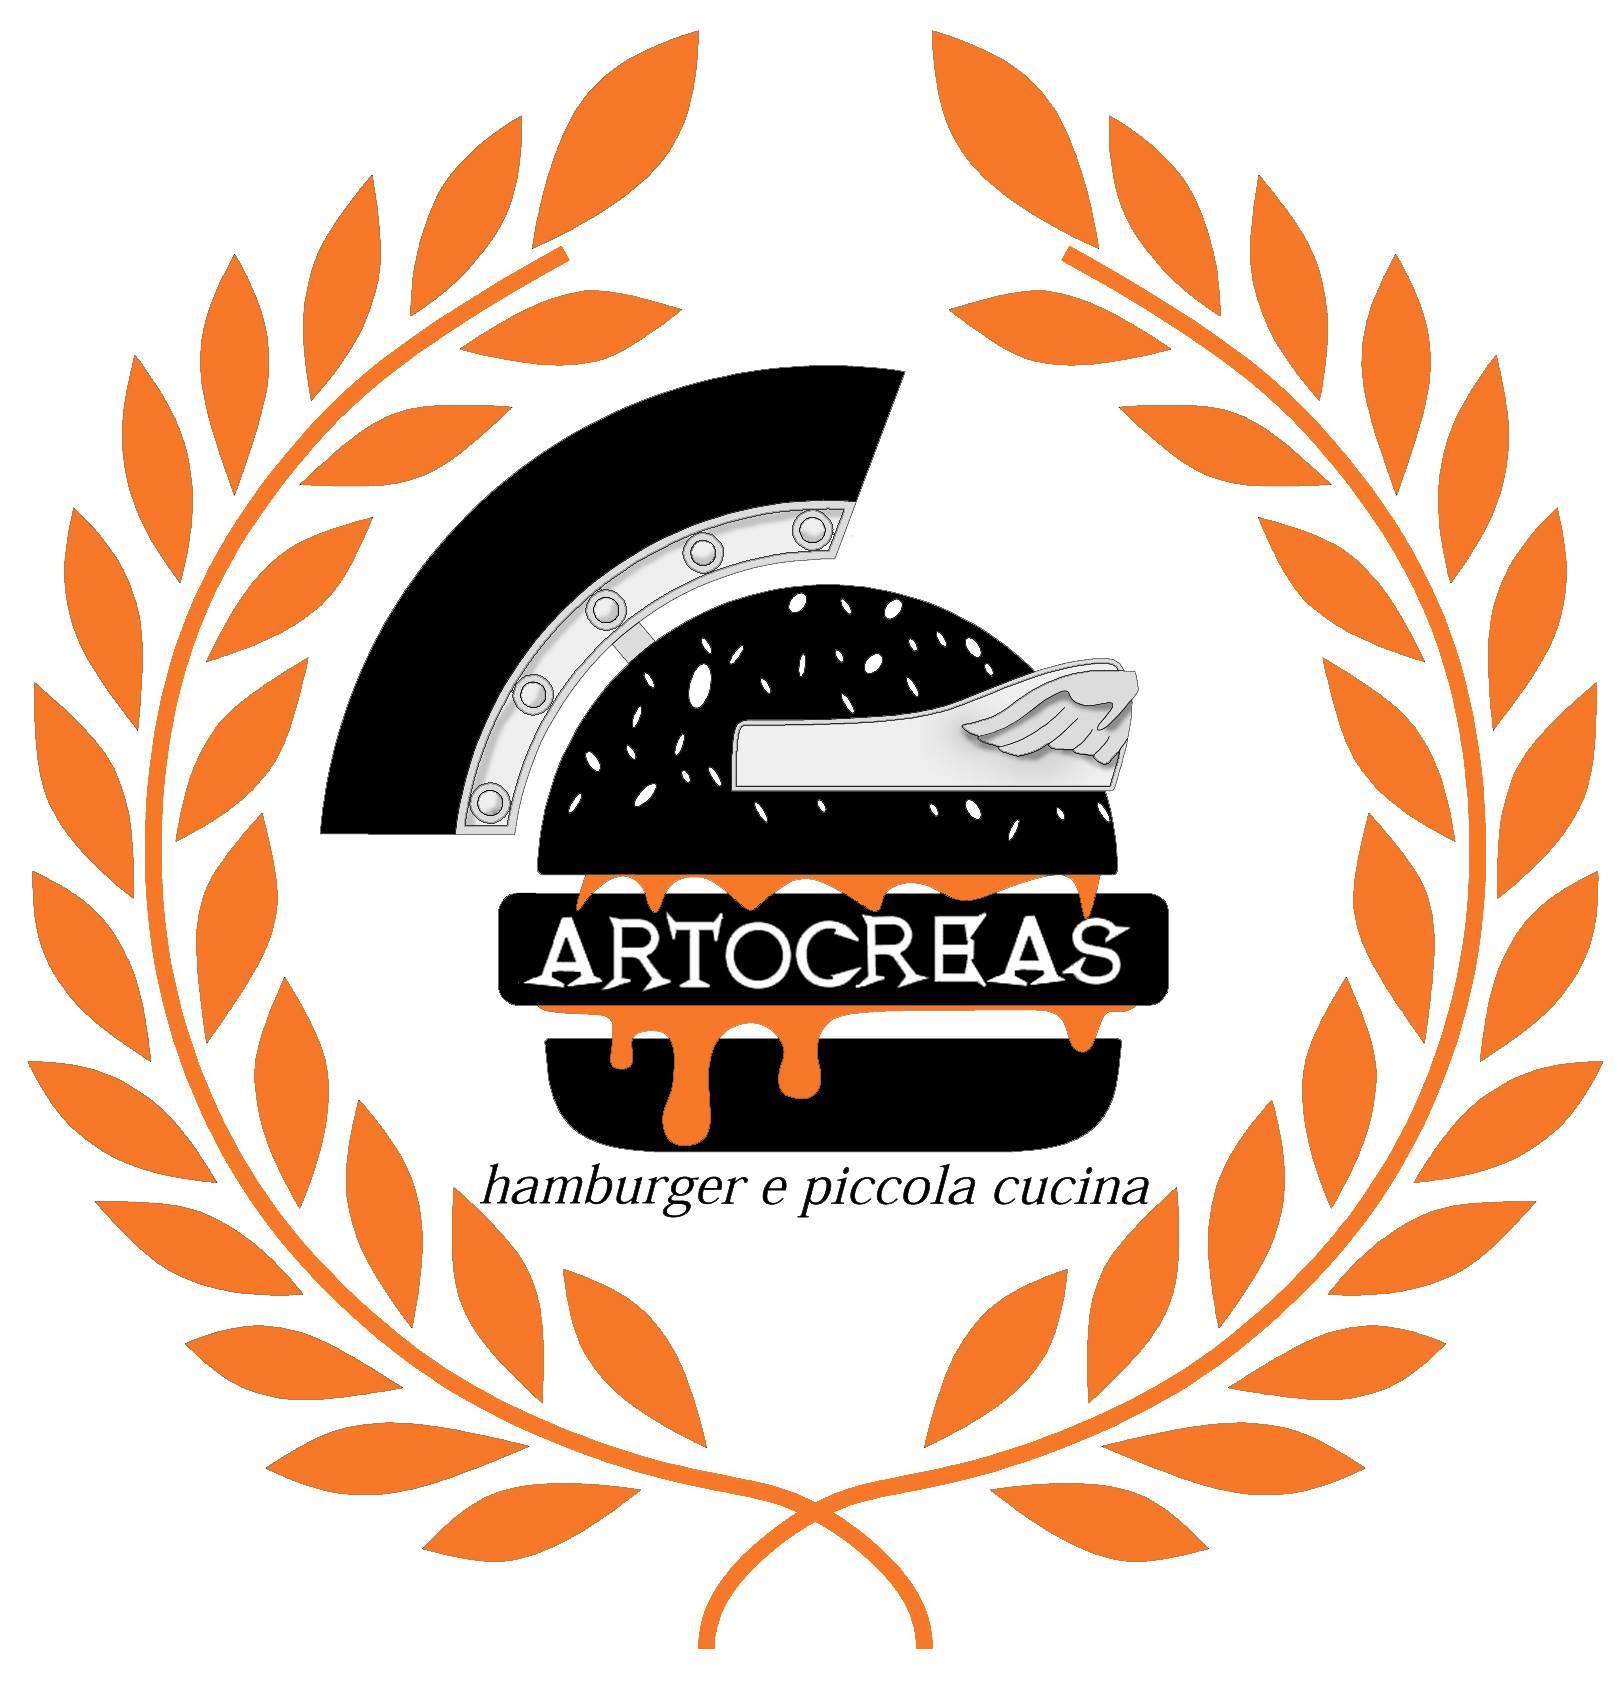 Artocreas